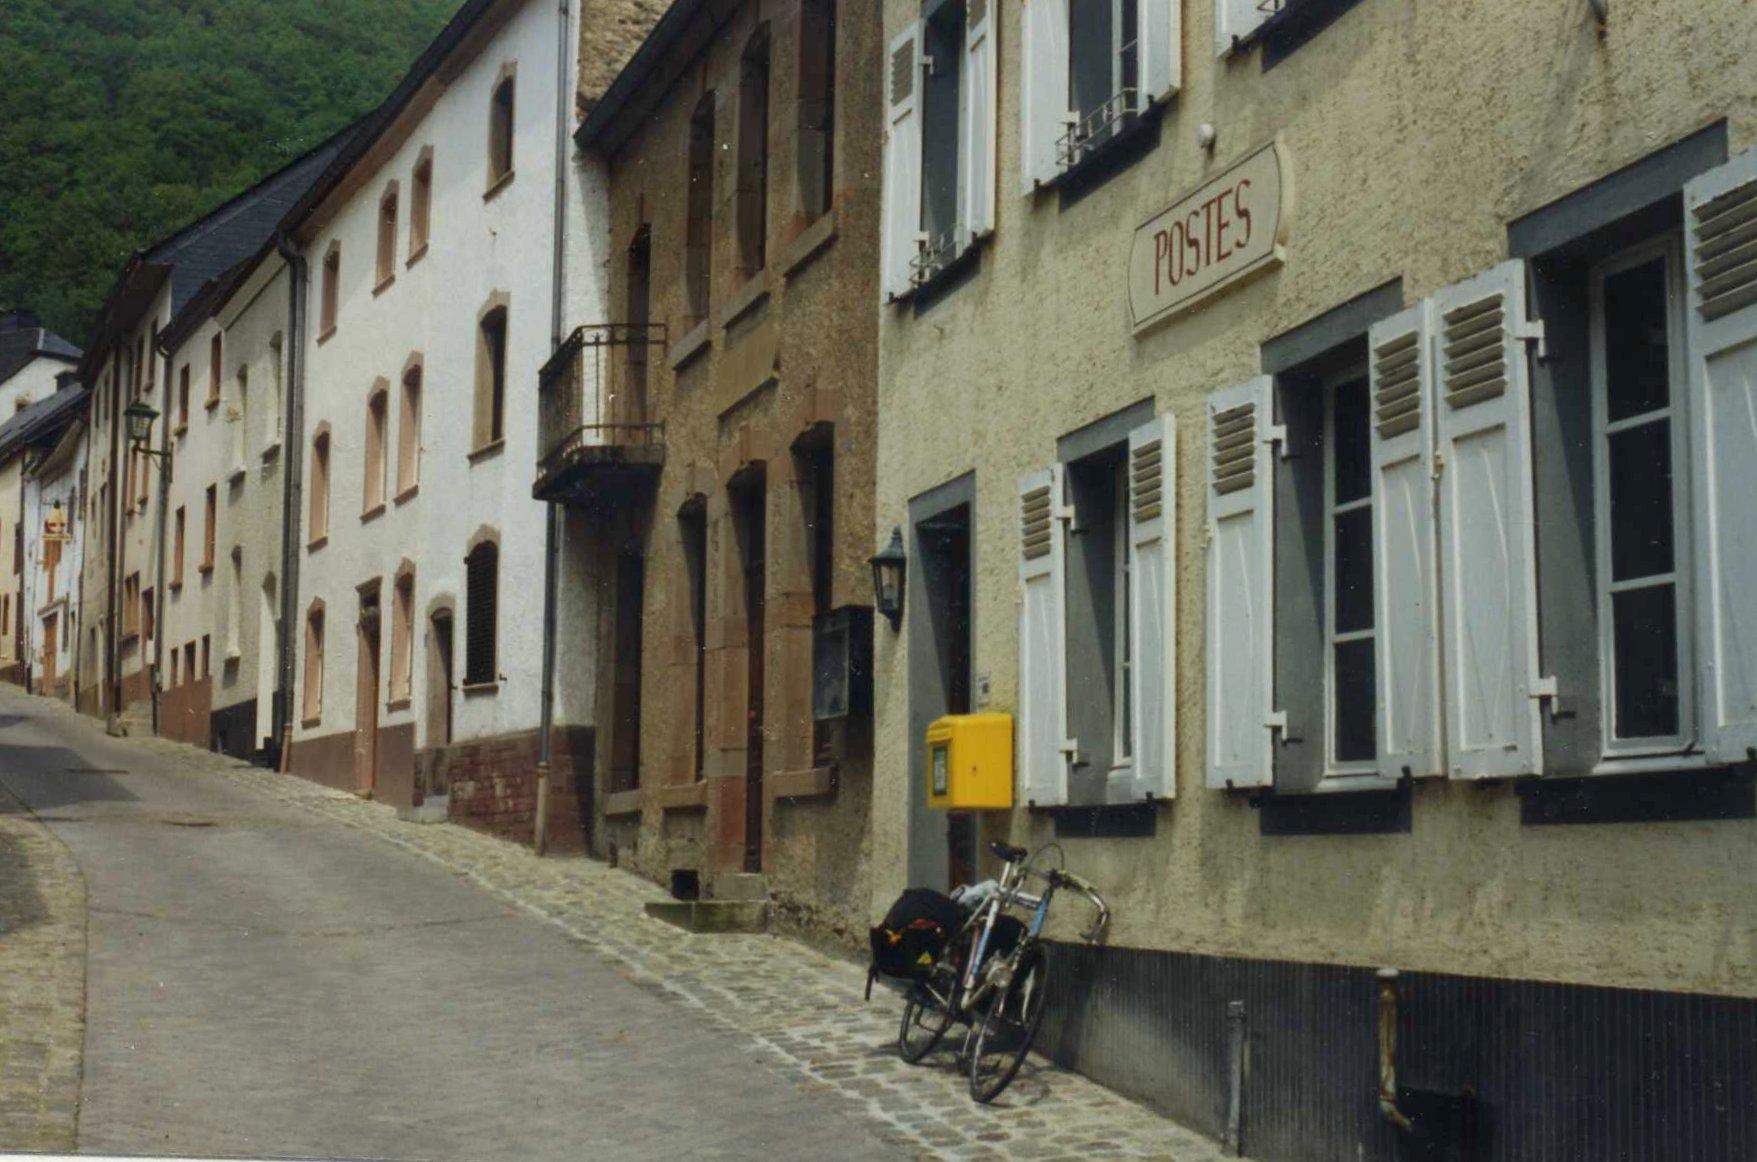 bureau de poste gare du luxembourg. Black Bedroom Furniture Sets. Home Design Ideas